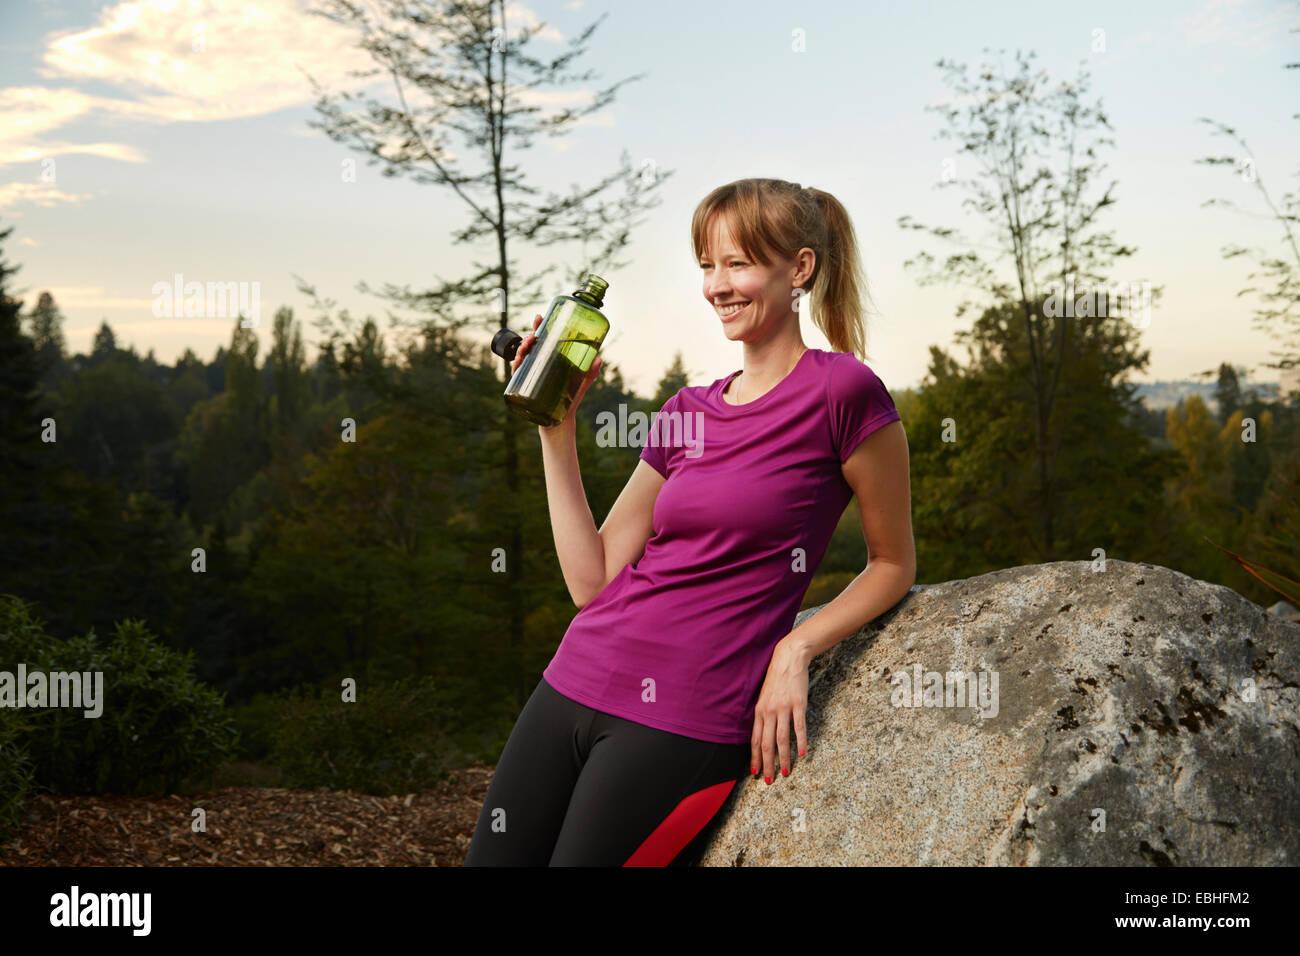 Female runner leaning against boulder in park drinking water - Stock Image